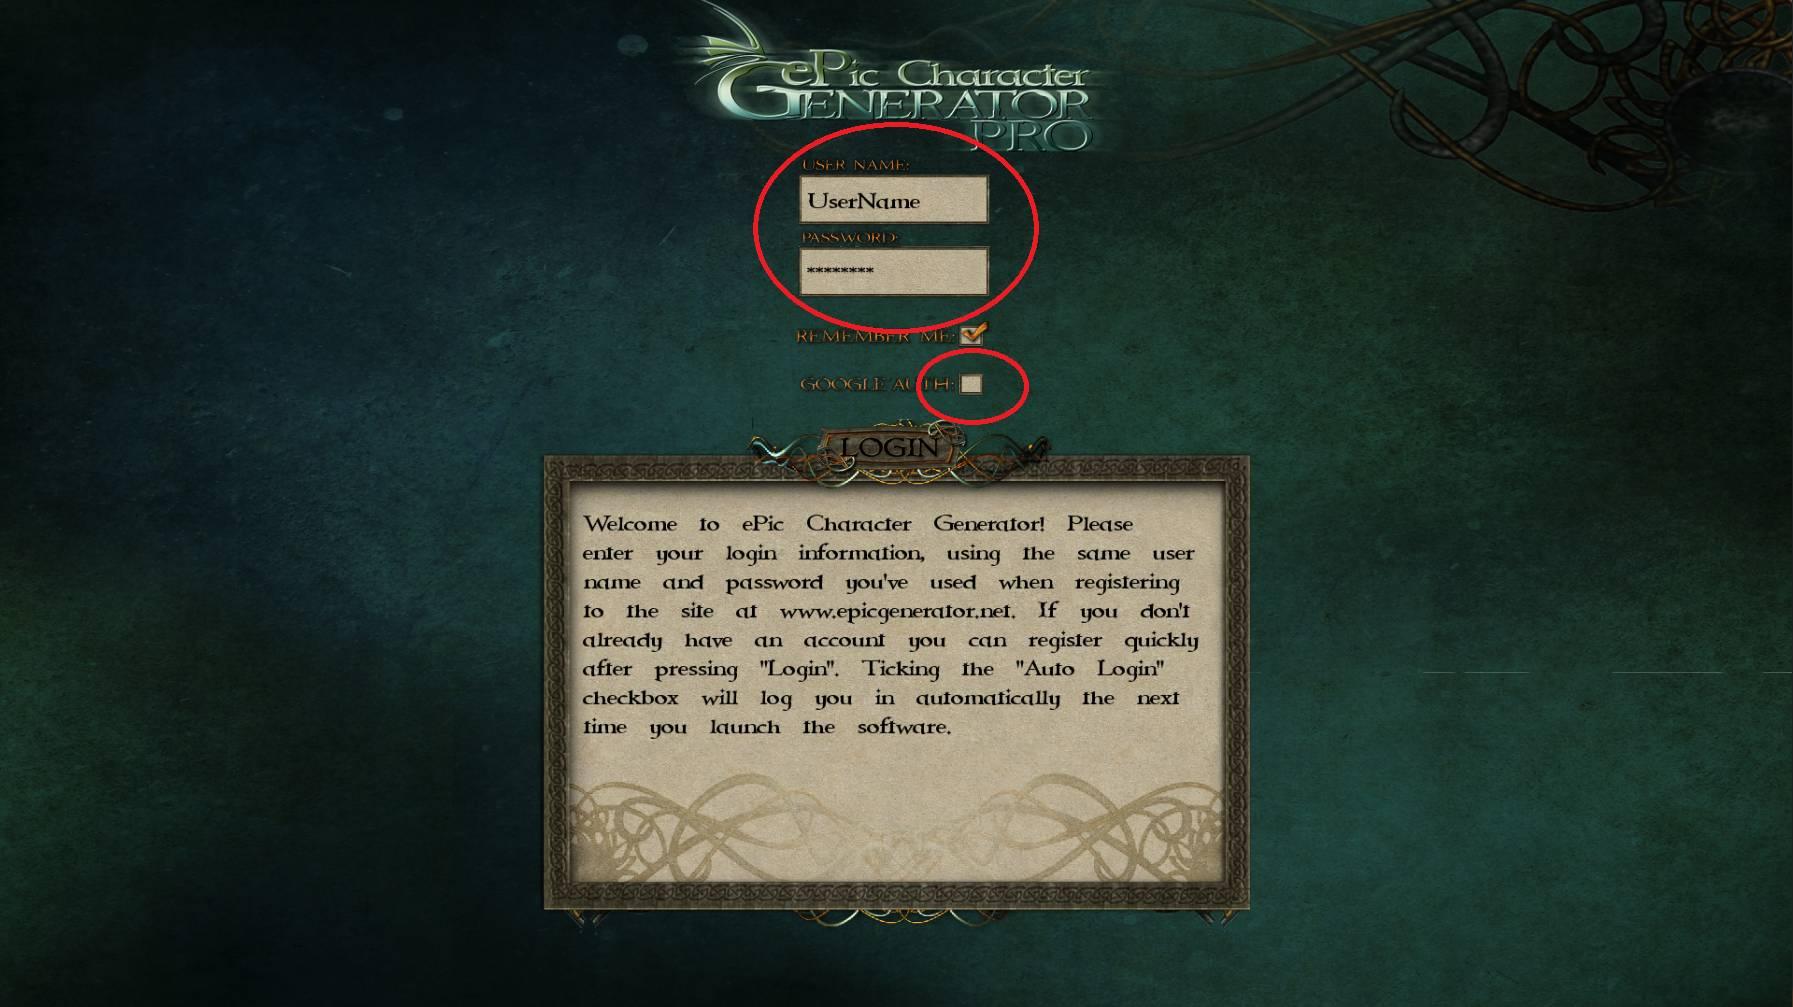 ePic Character Generator Login Details